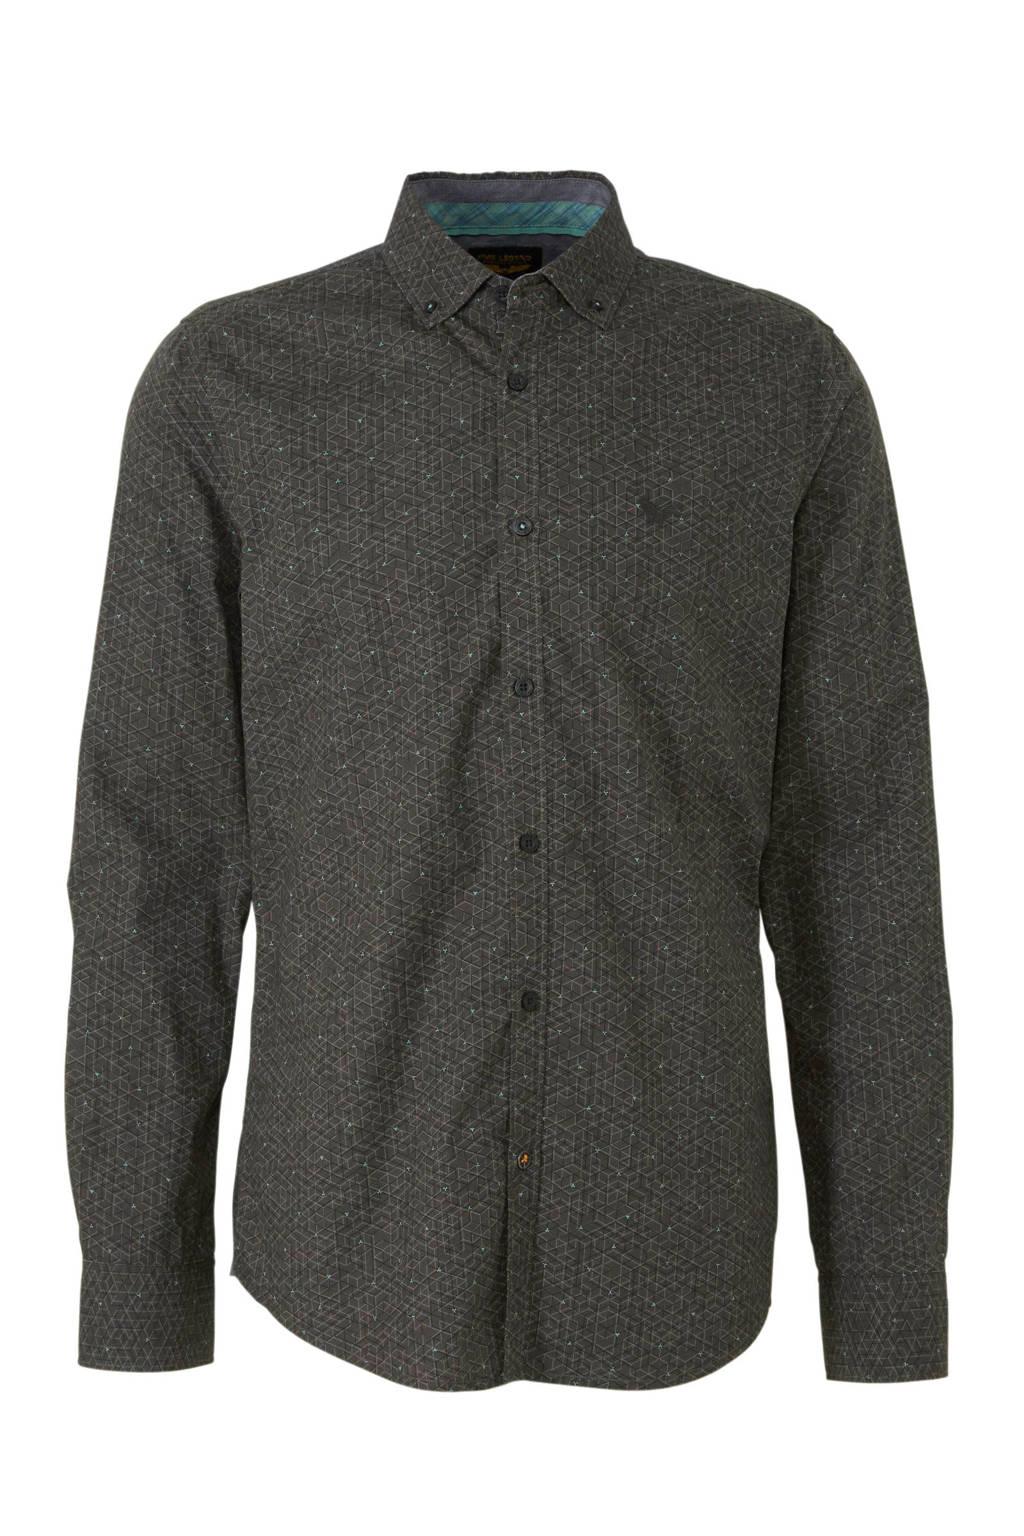 PME Legend regular fit overhemd met all over print bruin, Bruin